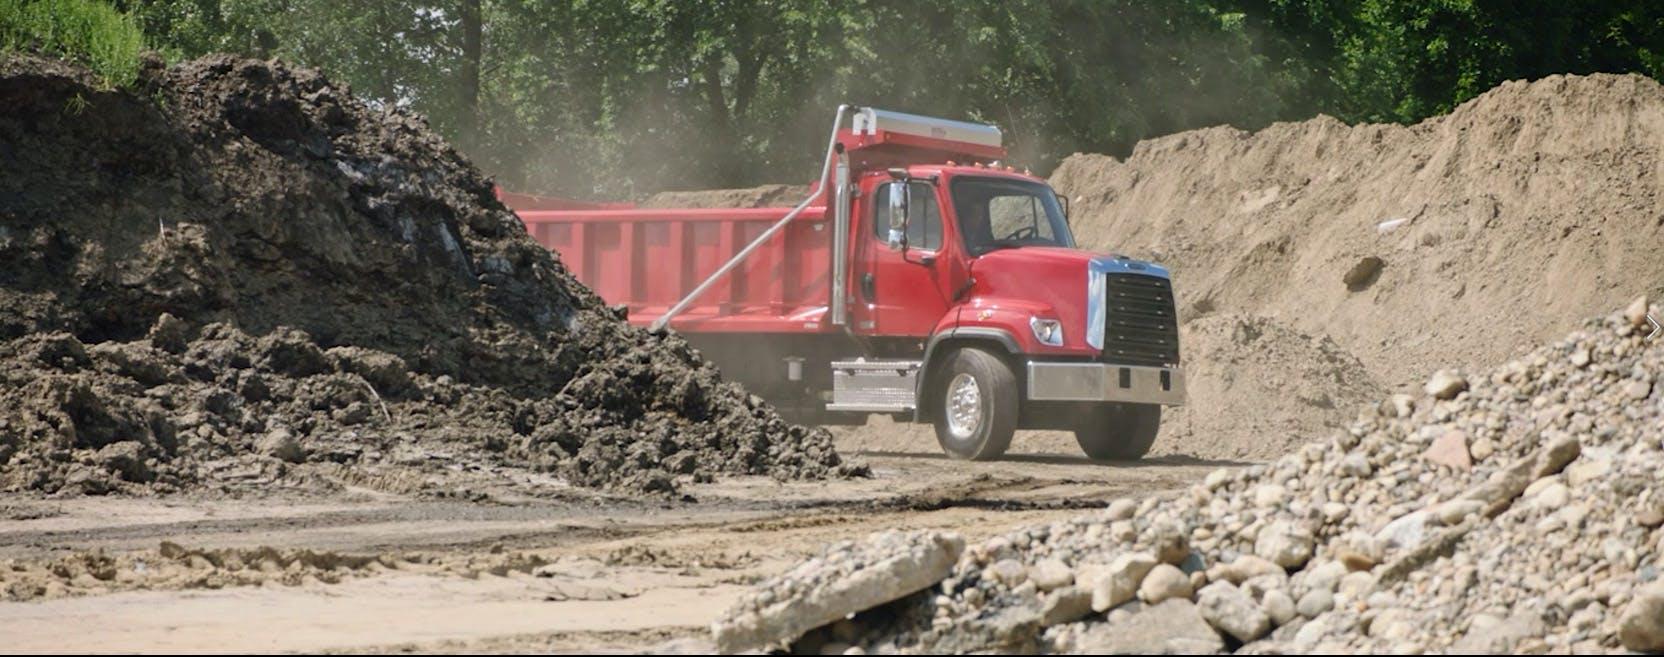 dump-truck-red-1664x657.jpg